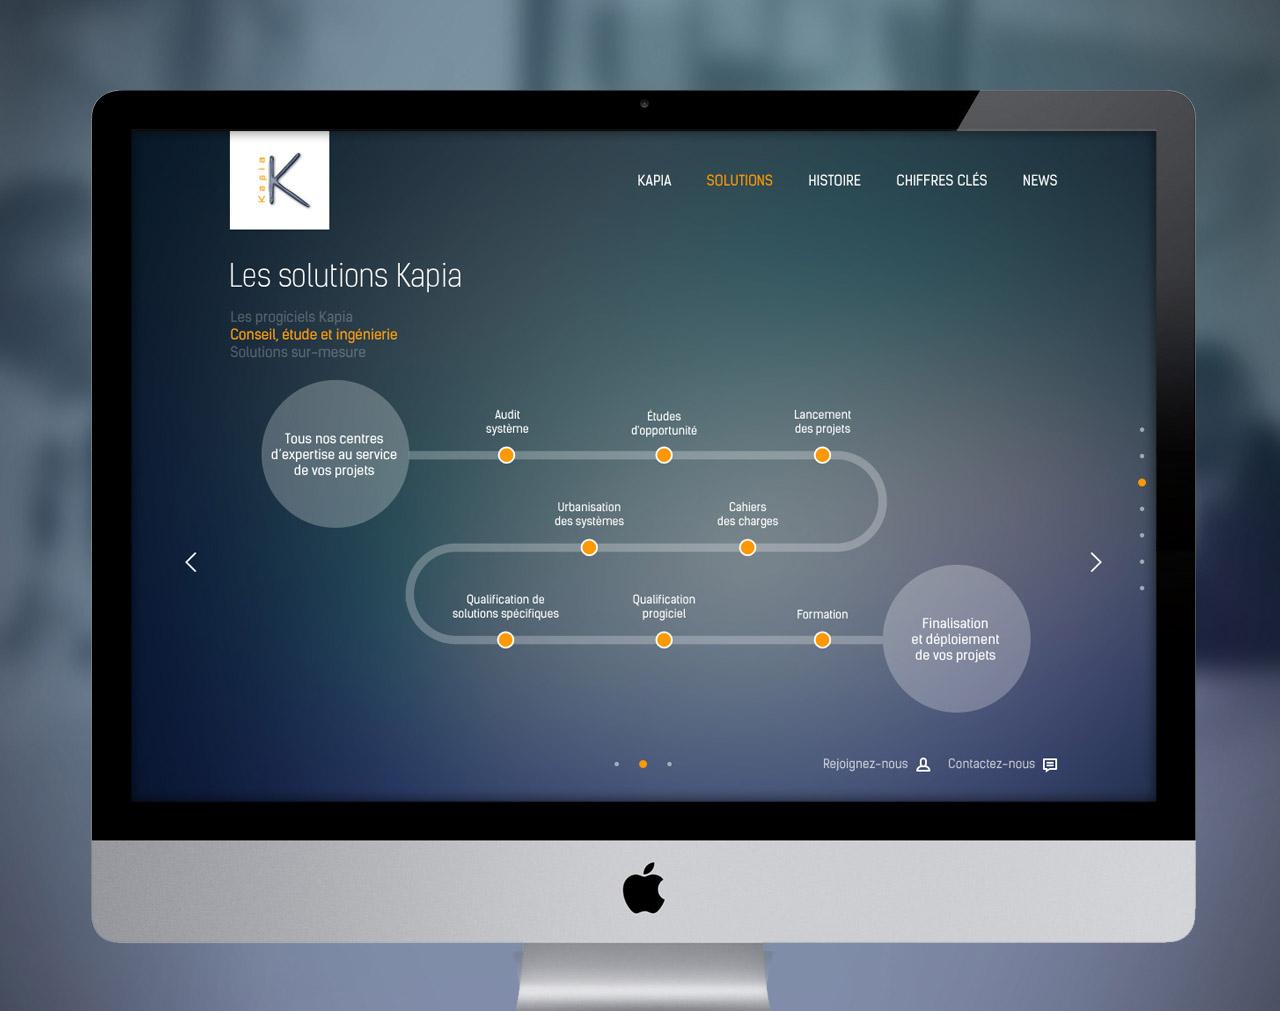 kapia-solutions-services-1-site-internet-responsive-design-creation-communication-caconcept-alexis-cretin-graphiste